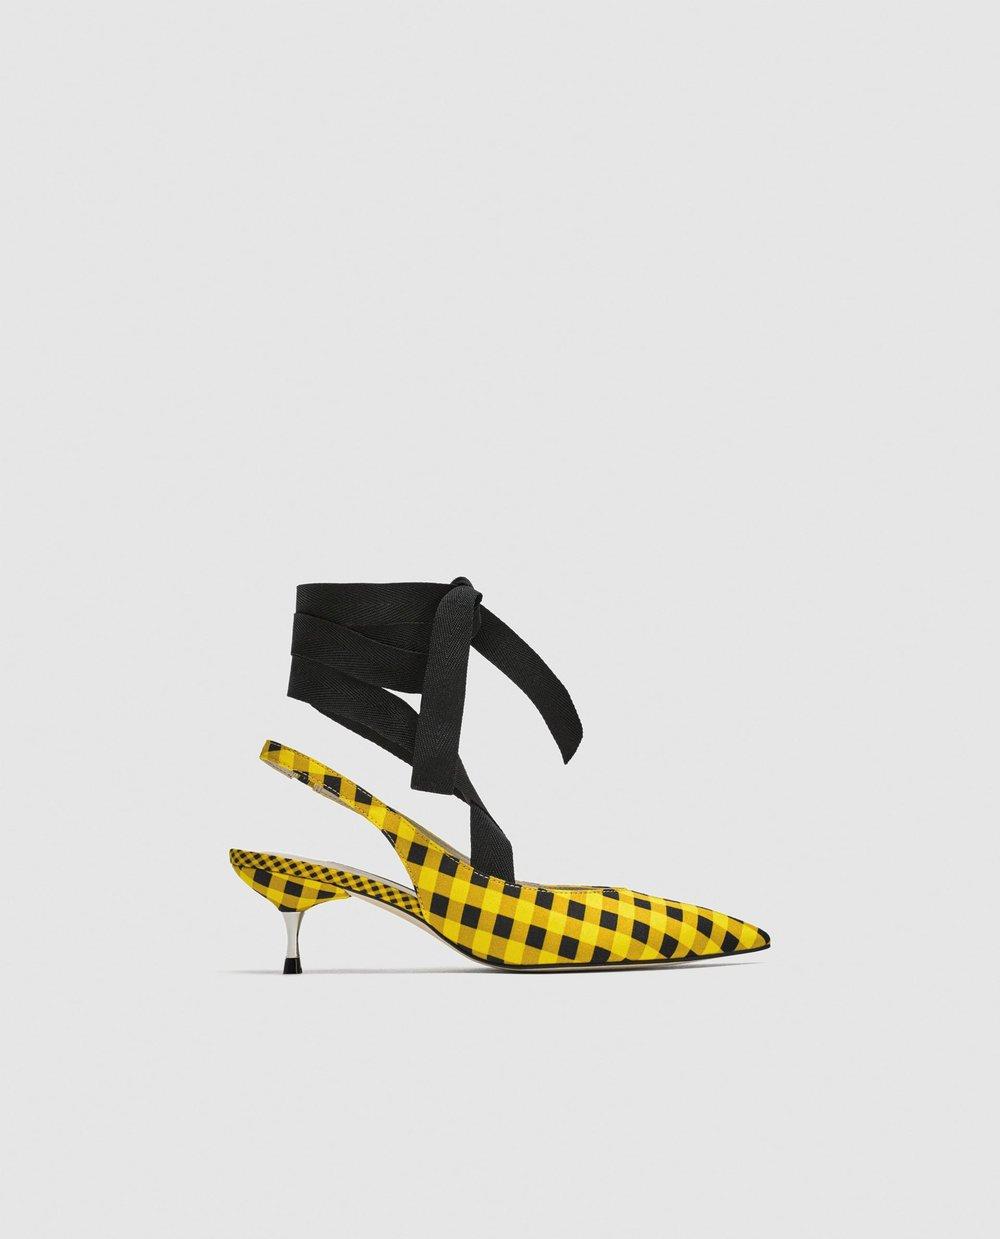 https://www.zara.com/ca/en/slingback-shoes-with-tie-bow-p12234301.html?v1=5326558&v2=969020